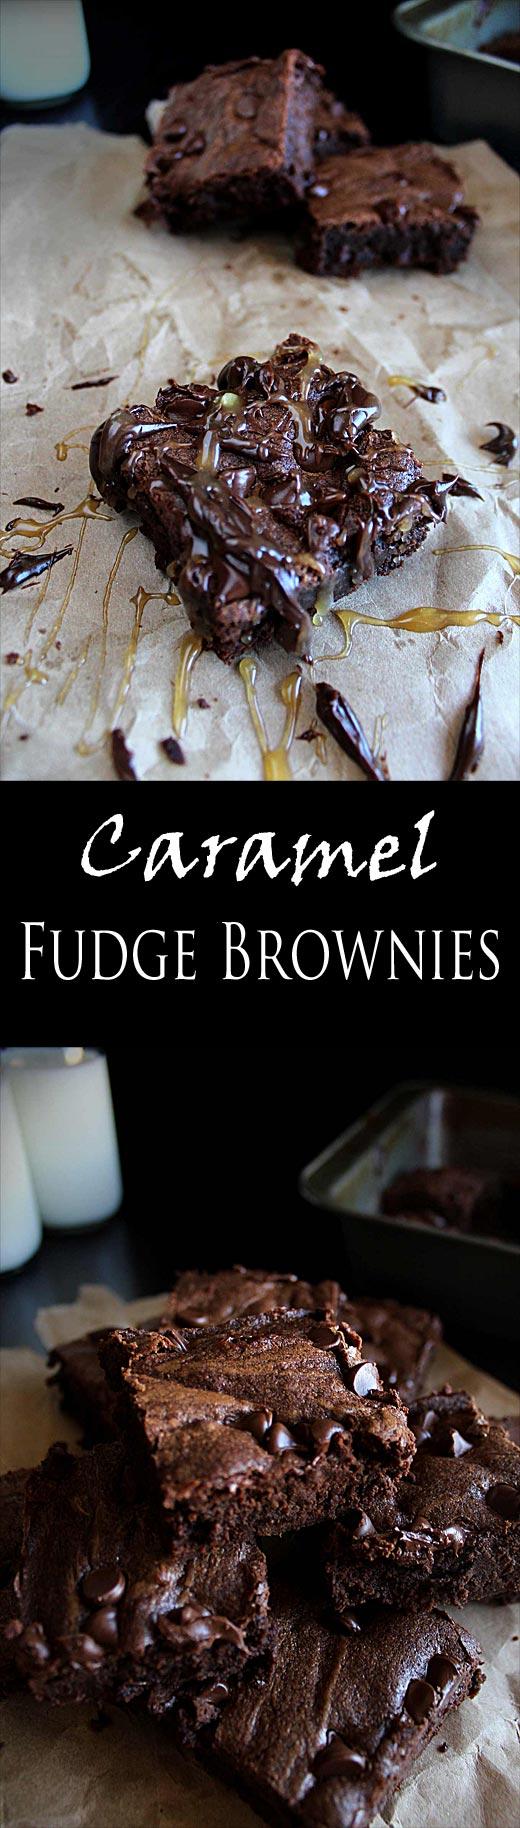 Chocolate Chunk Caramel Fudge Brownies | Chocolate Brownies | Homemade Hot Fudge | Caramel Sauce | Homemade Brownie Recipe